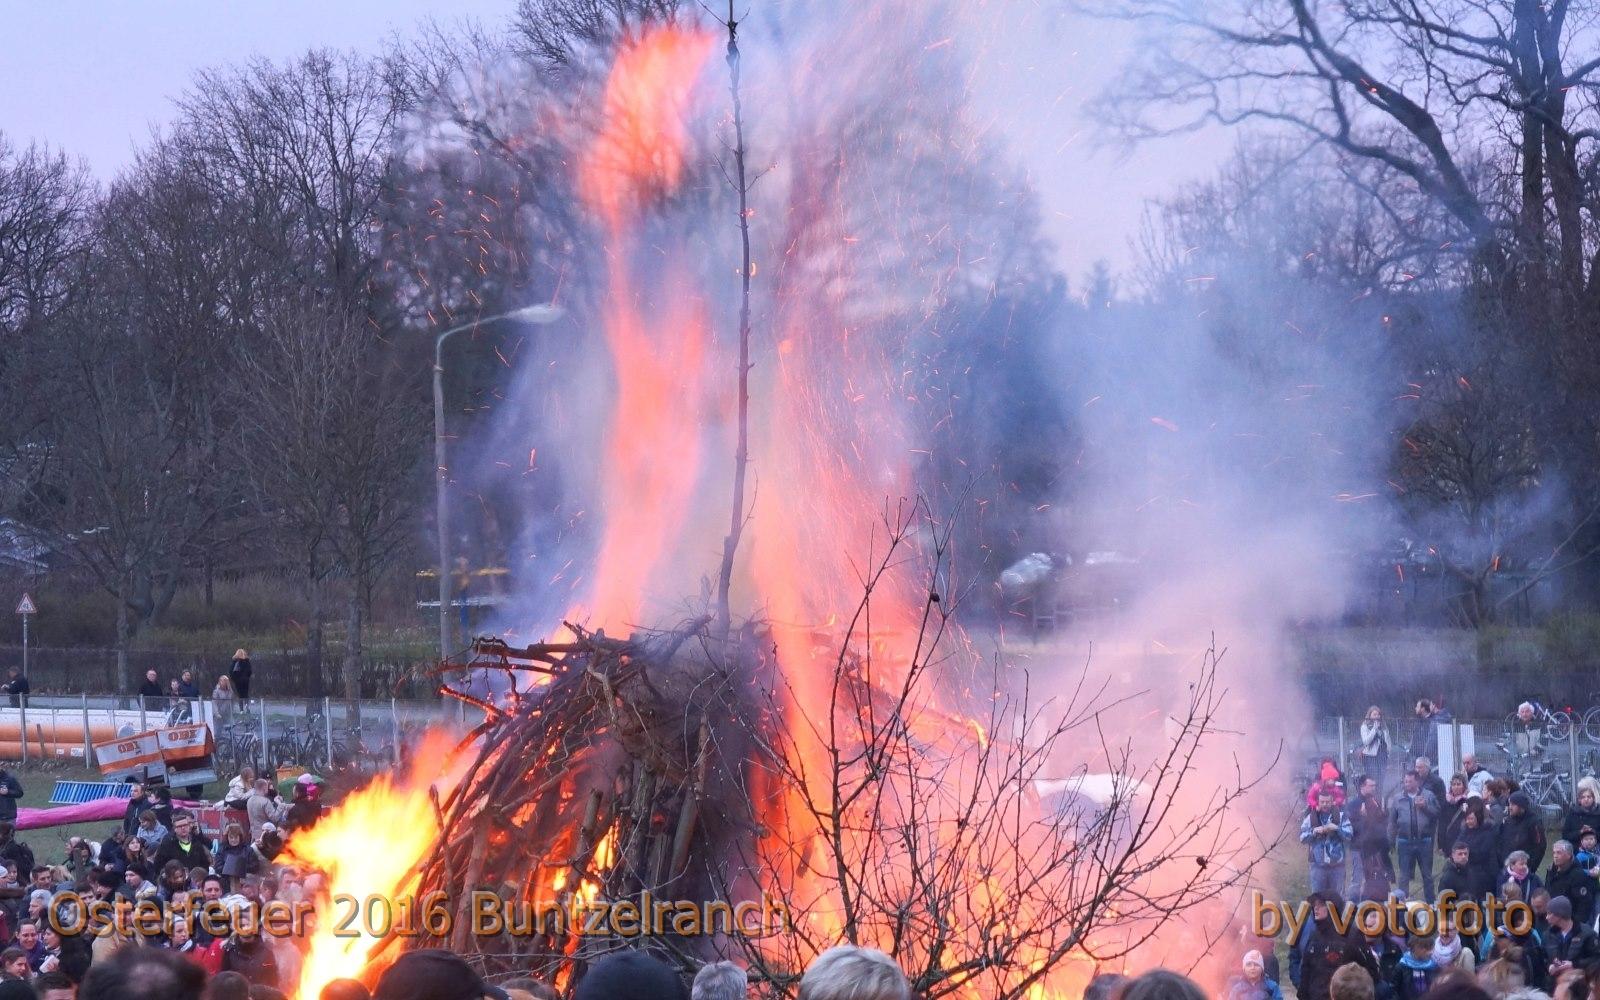 Osterfeuer 2016 Buntzelranch  142